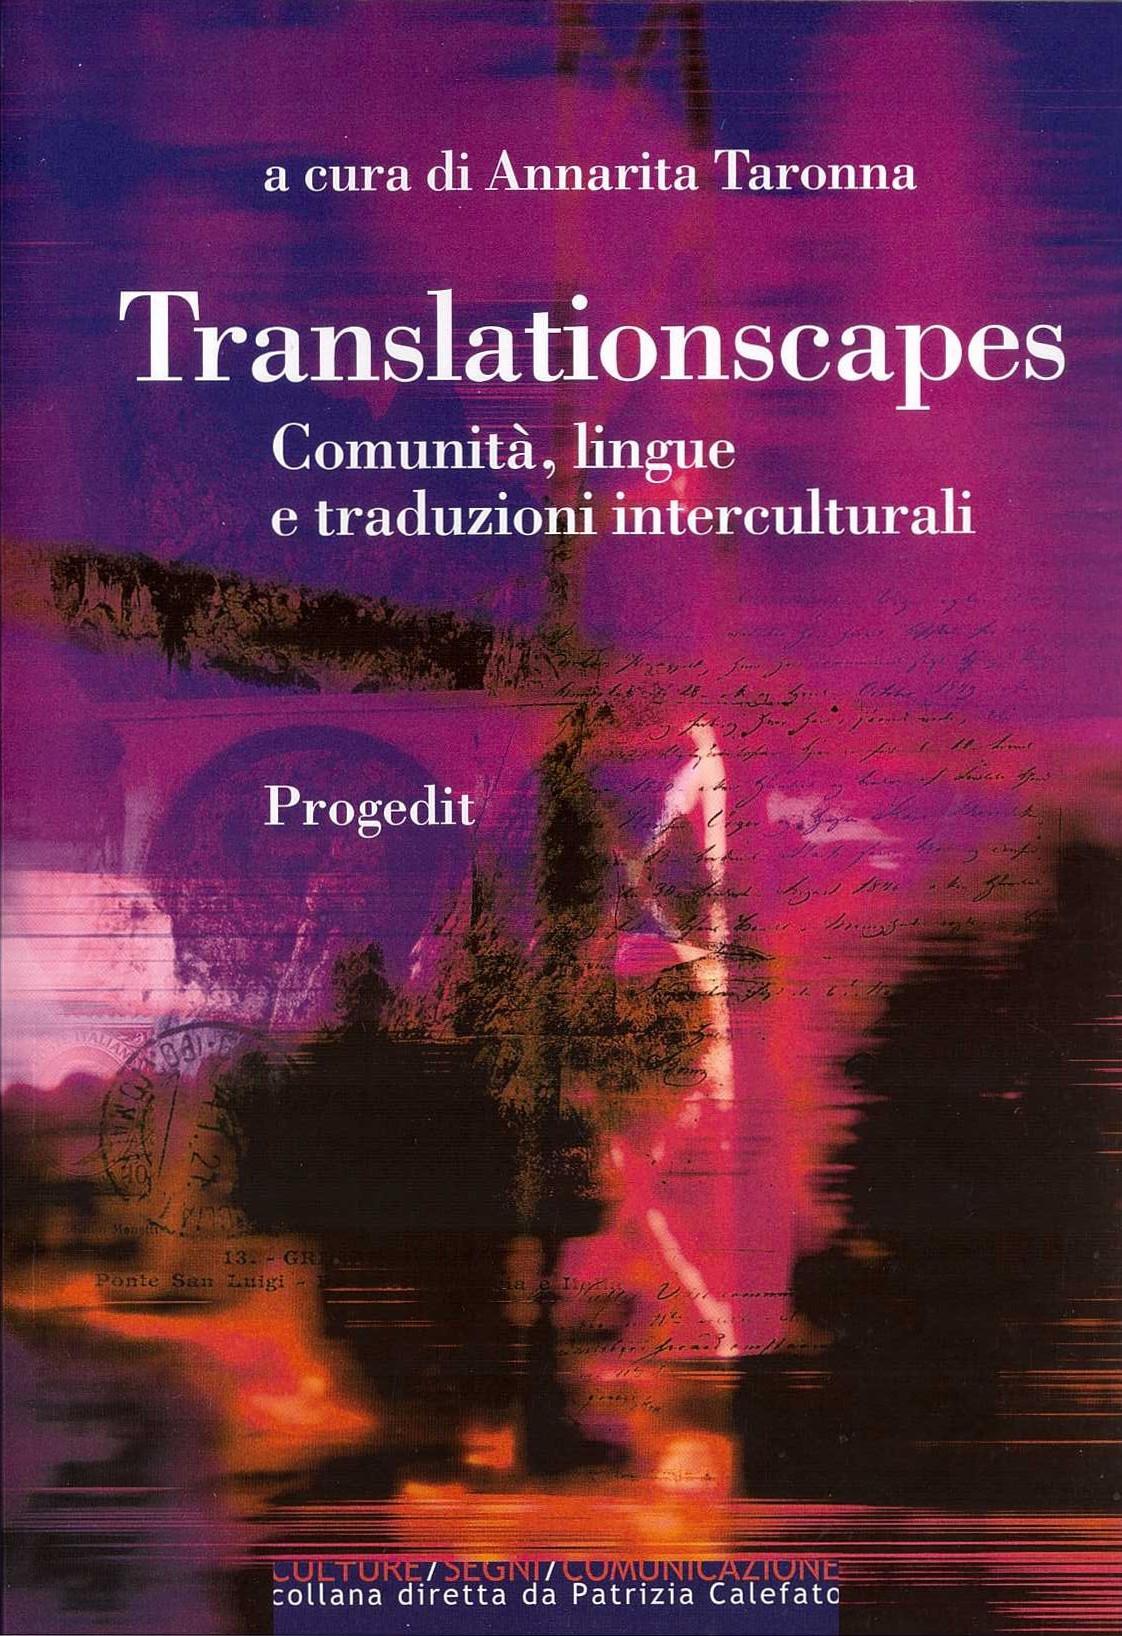 Translationscapes